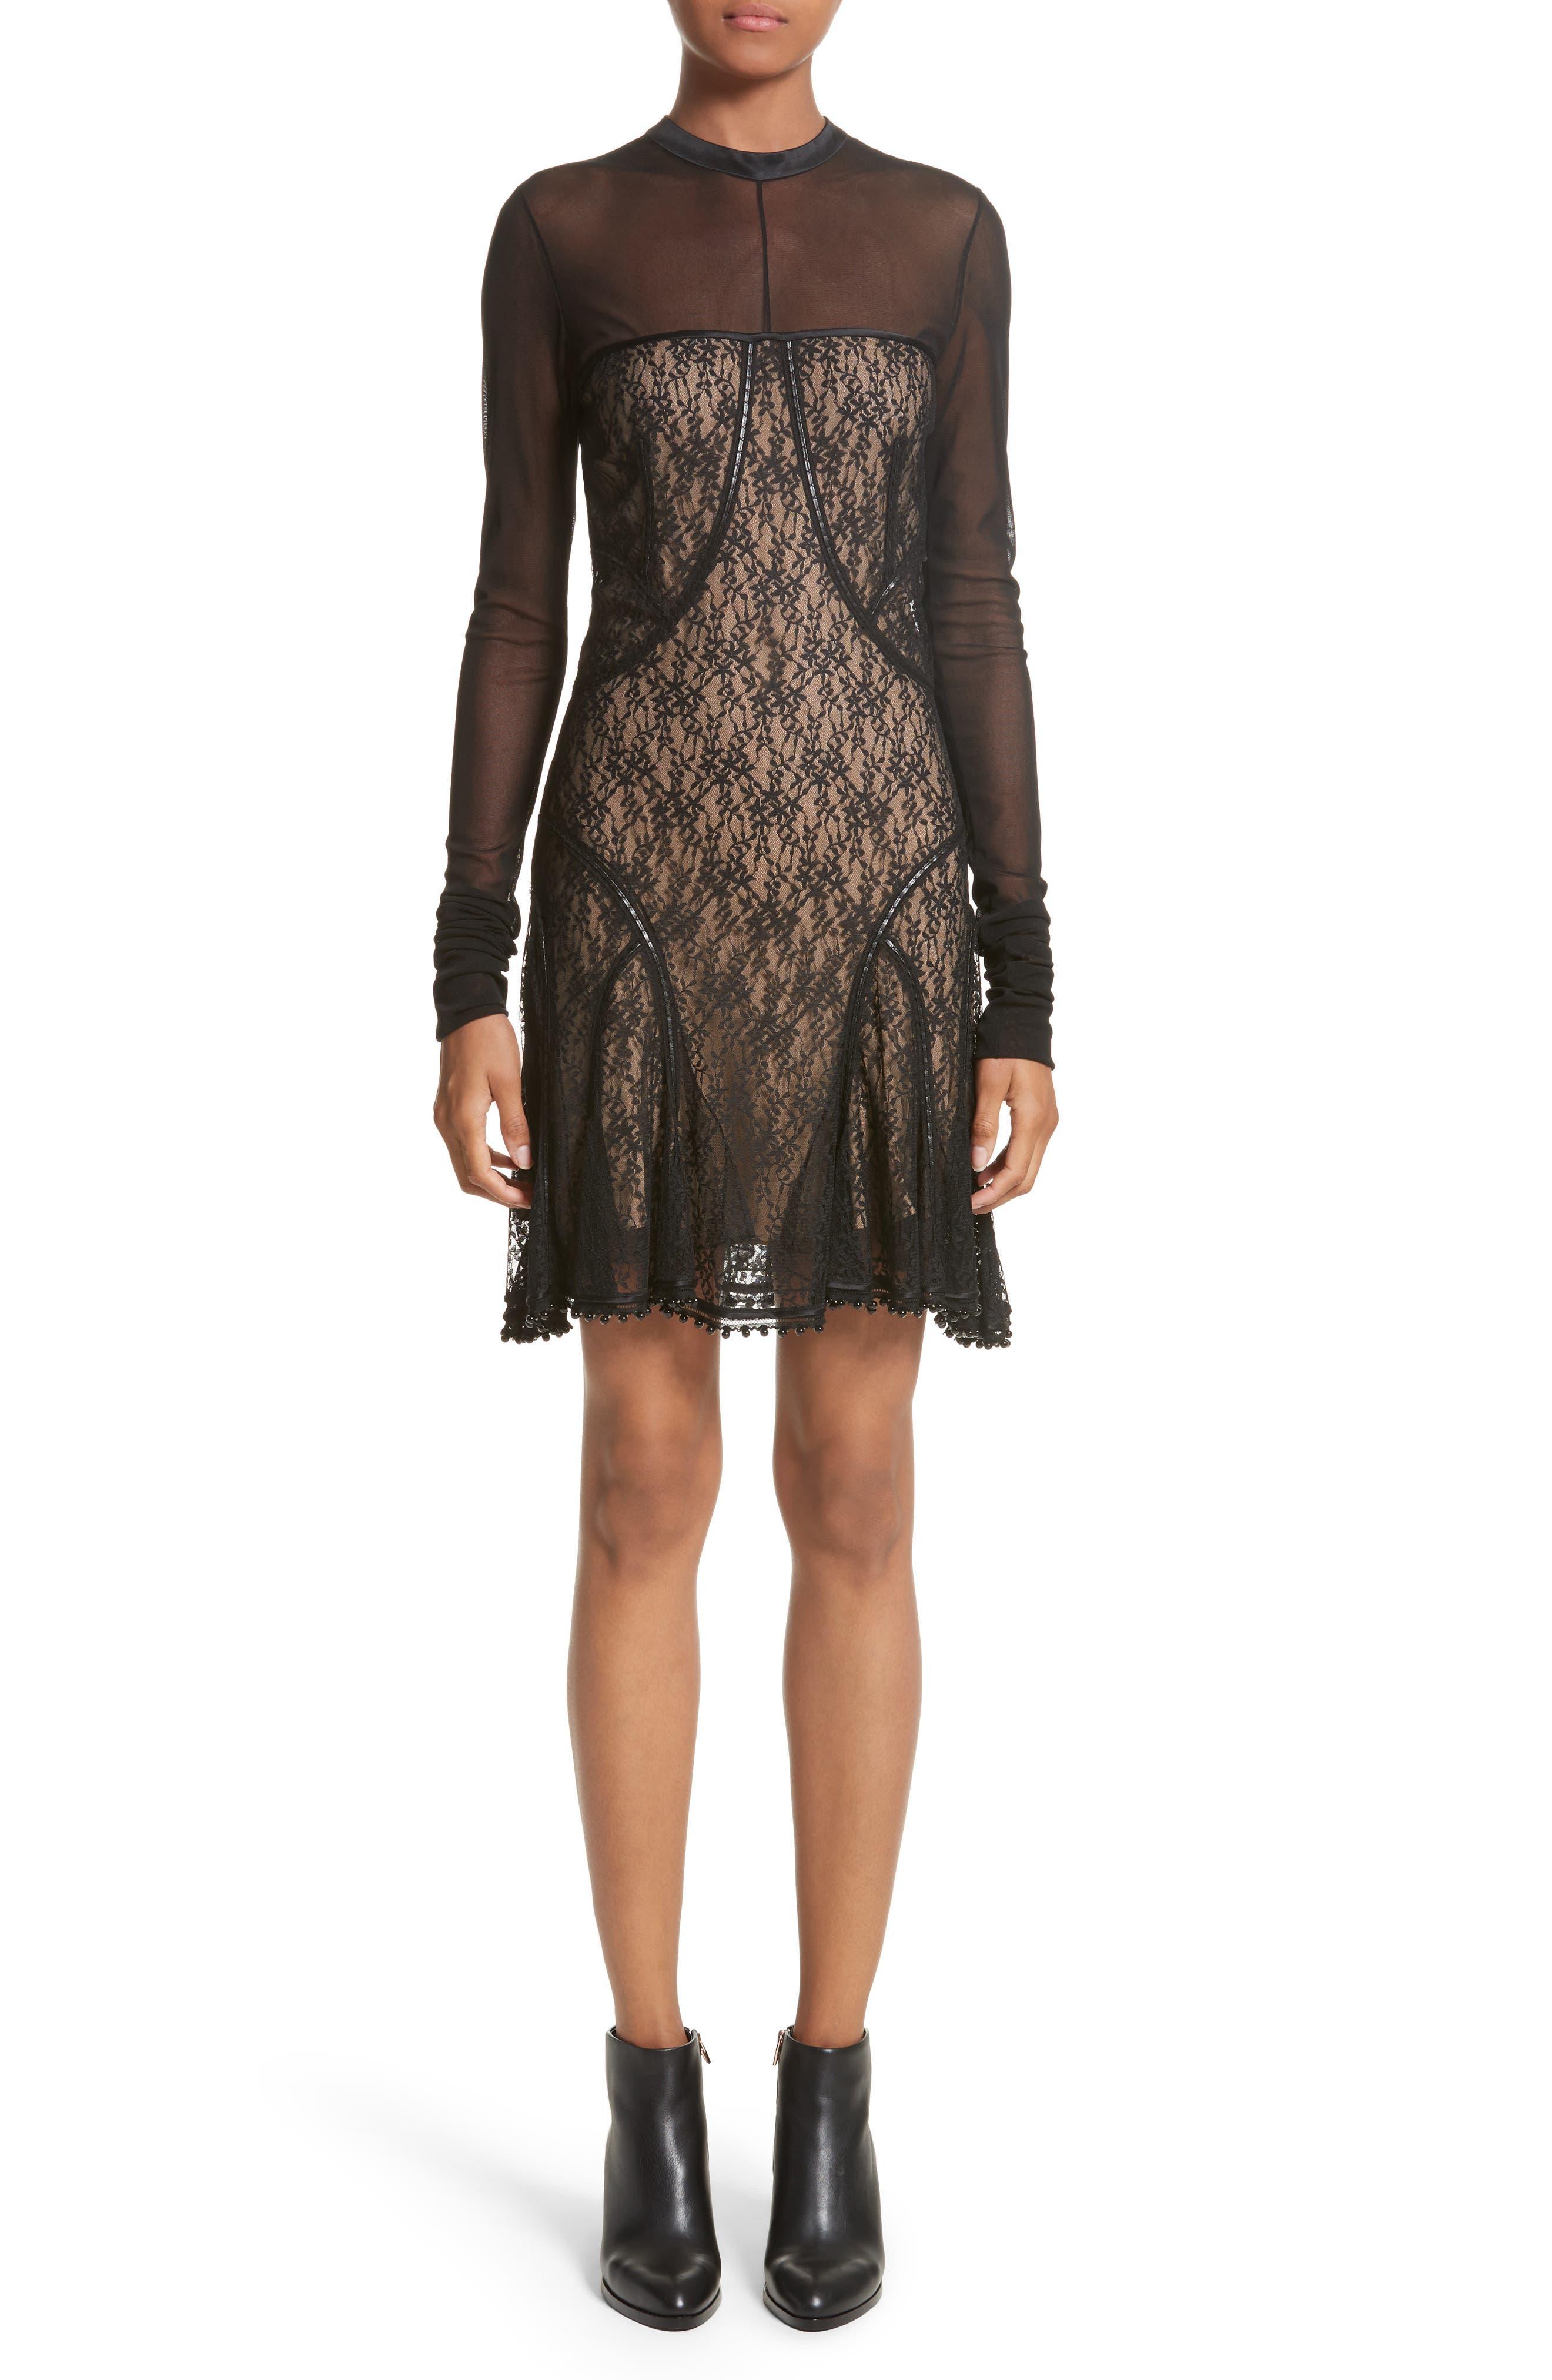 Alternate Image 1 Selected - Alexander Wang Lace Dress